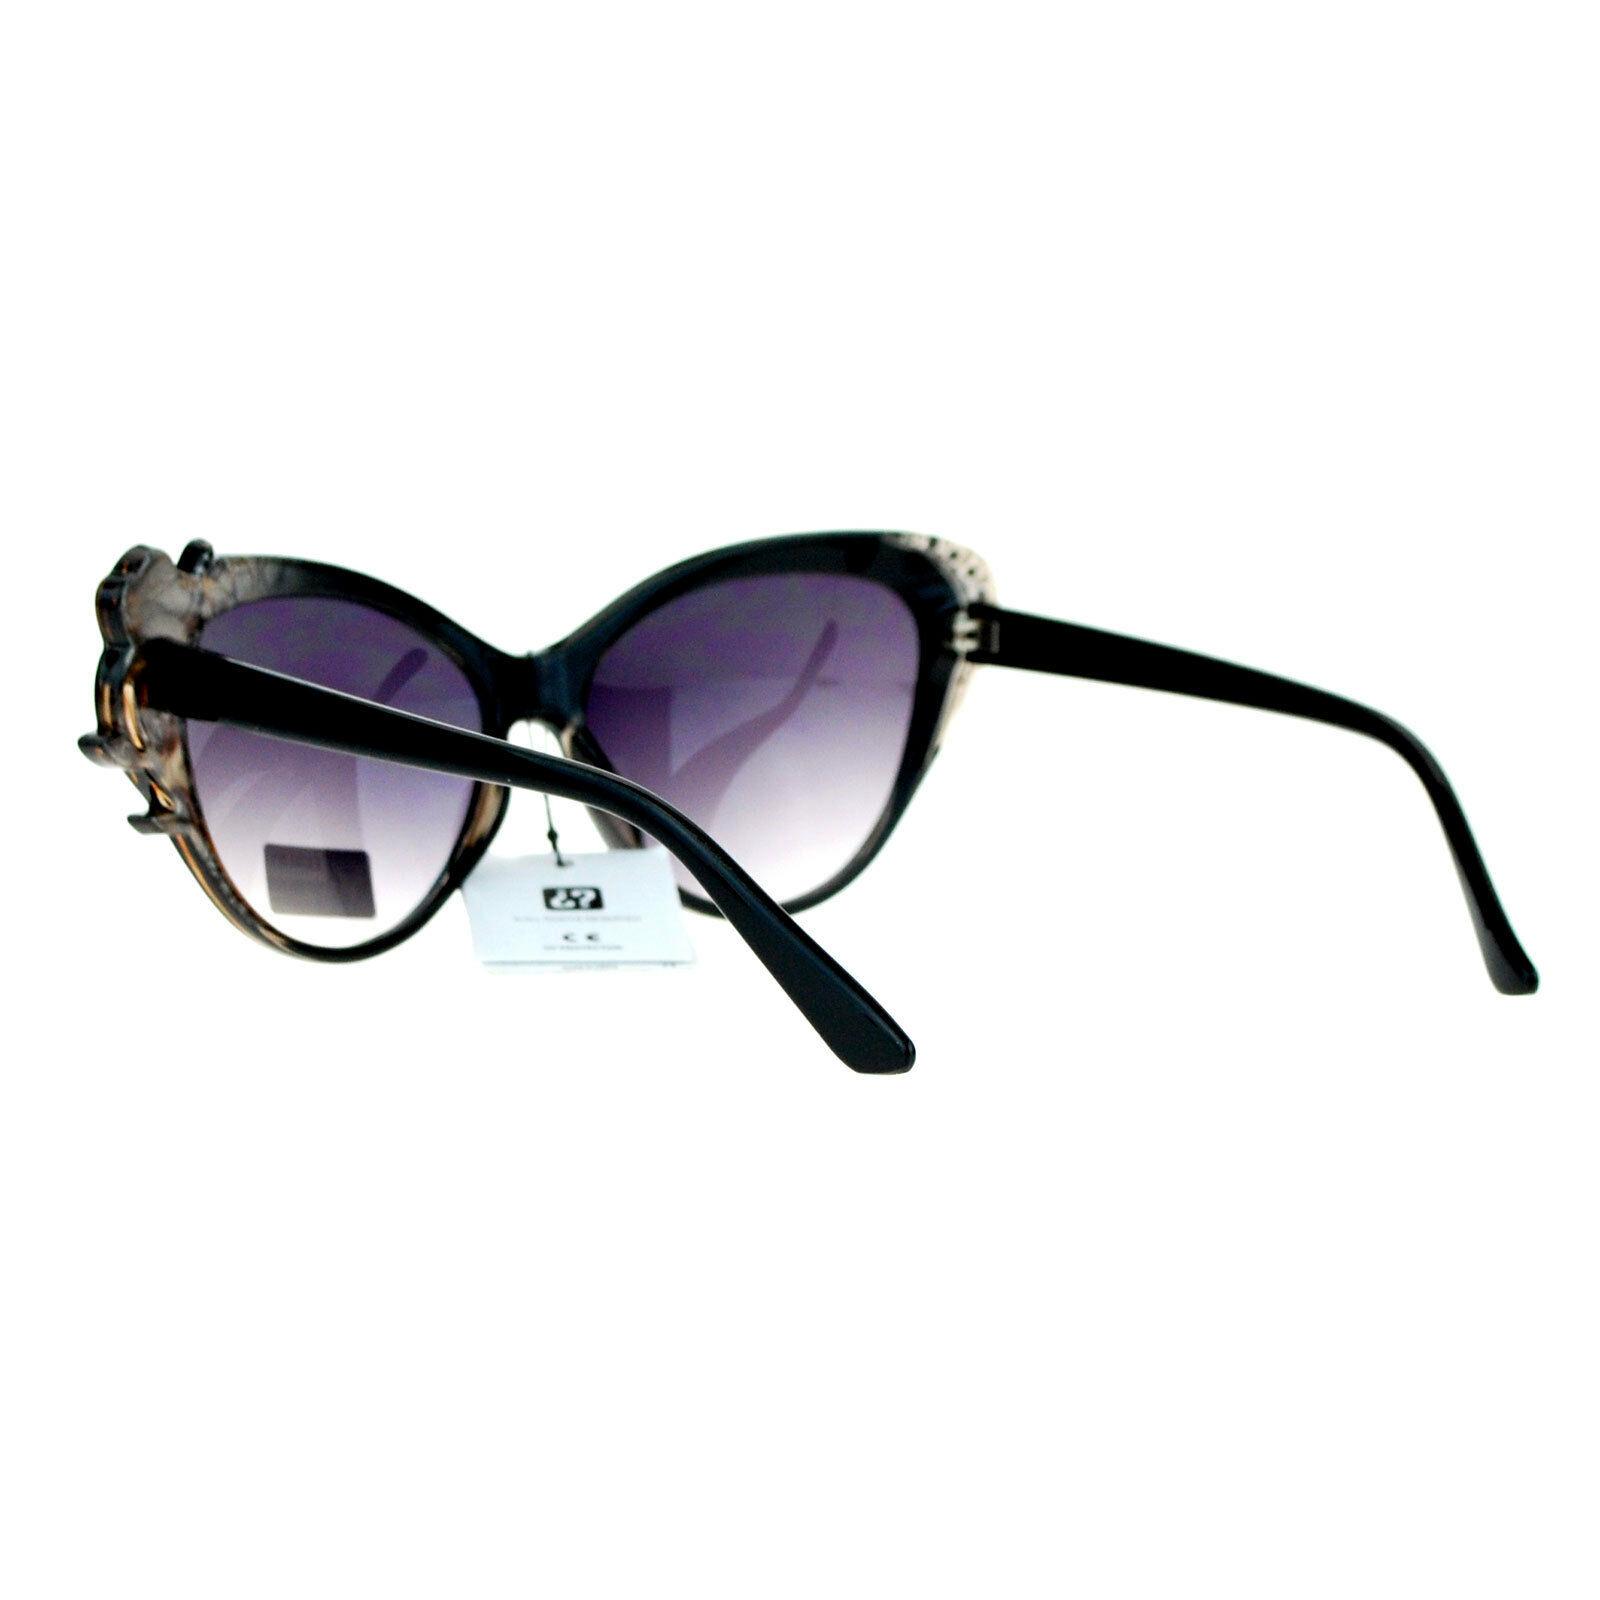 Womens Fashion Sunglasses Cateye Frame Rhinestones Rose Design Eyewear